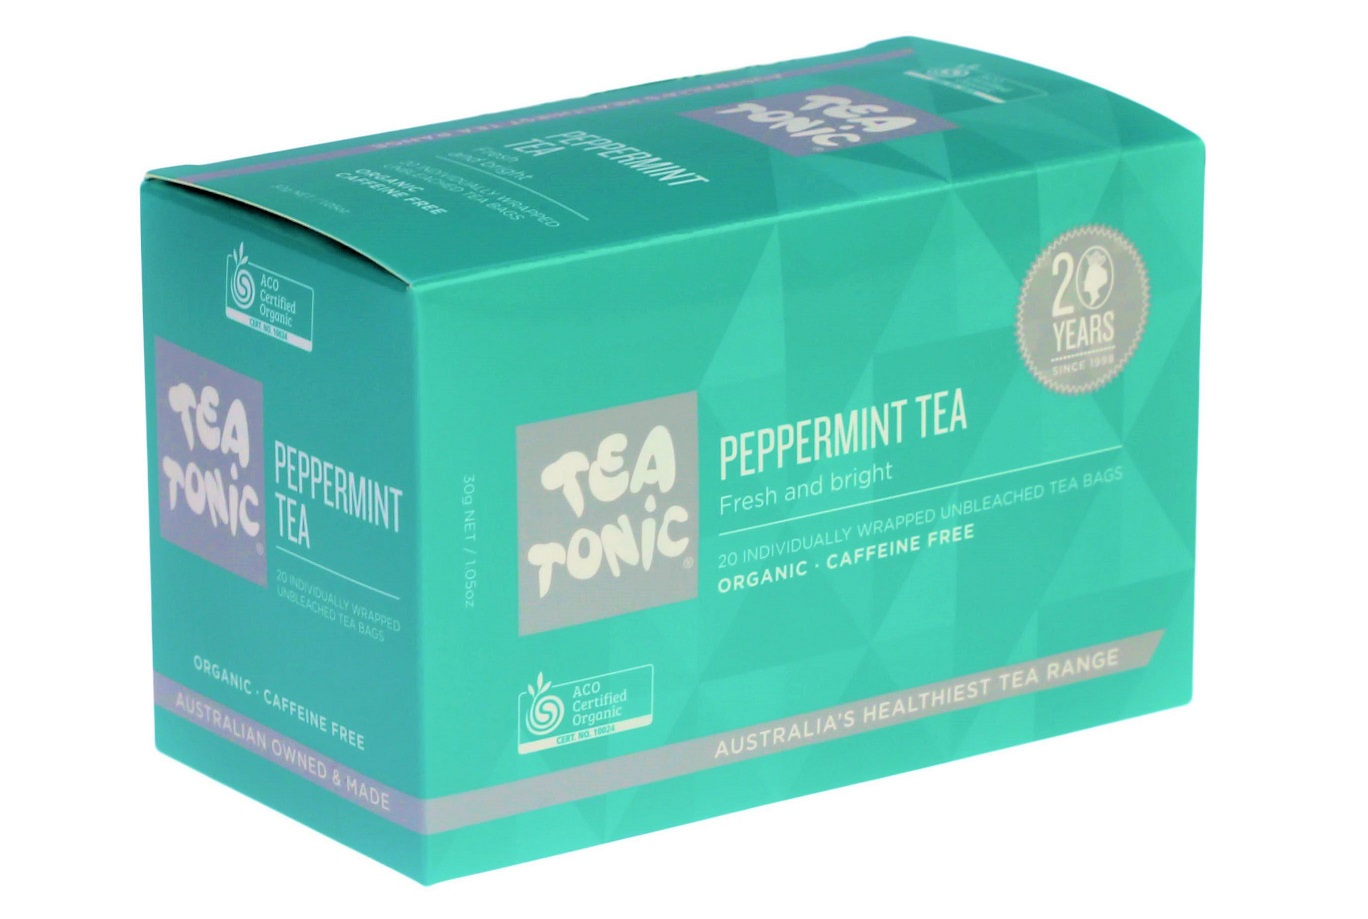 Tea Tonic Peppermint Tea